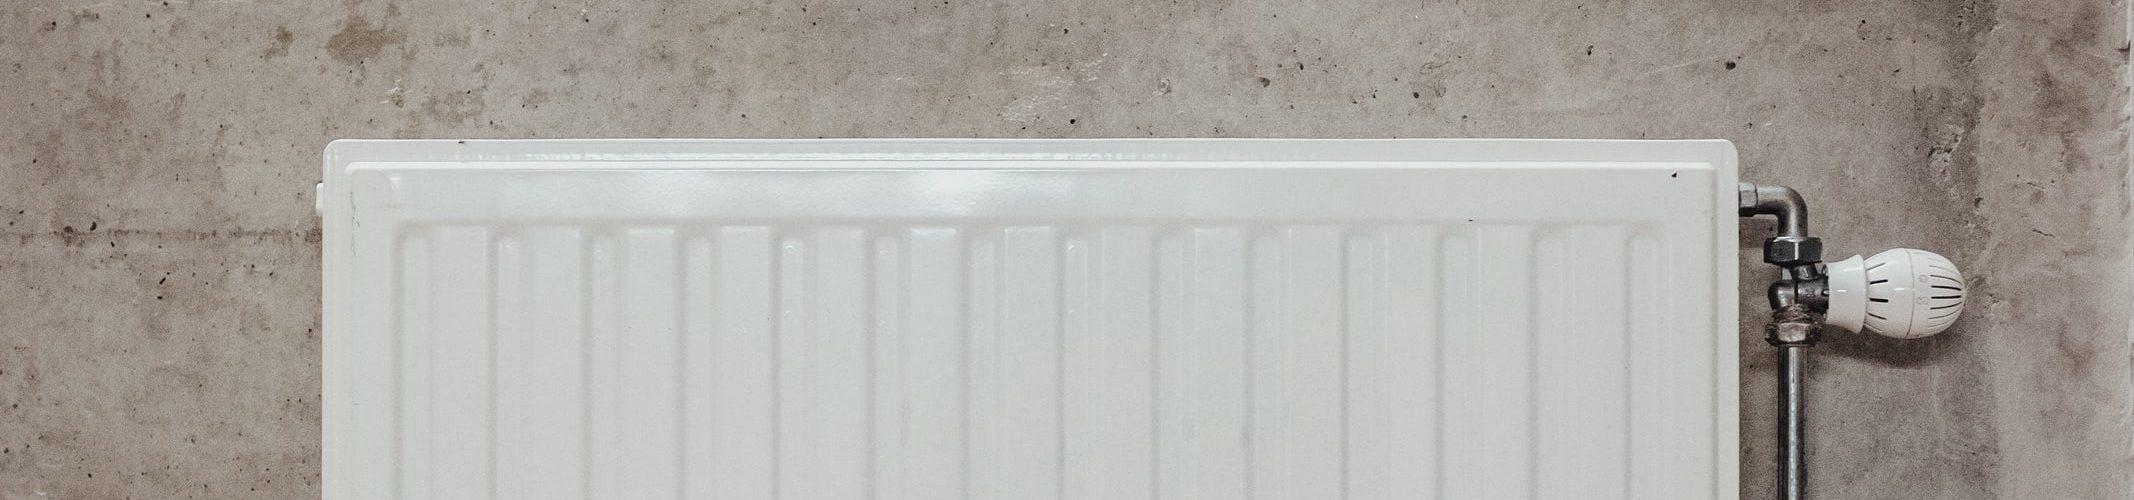 strak-radiator-wit